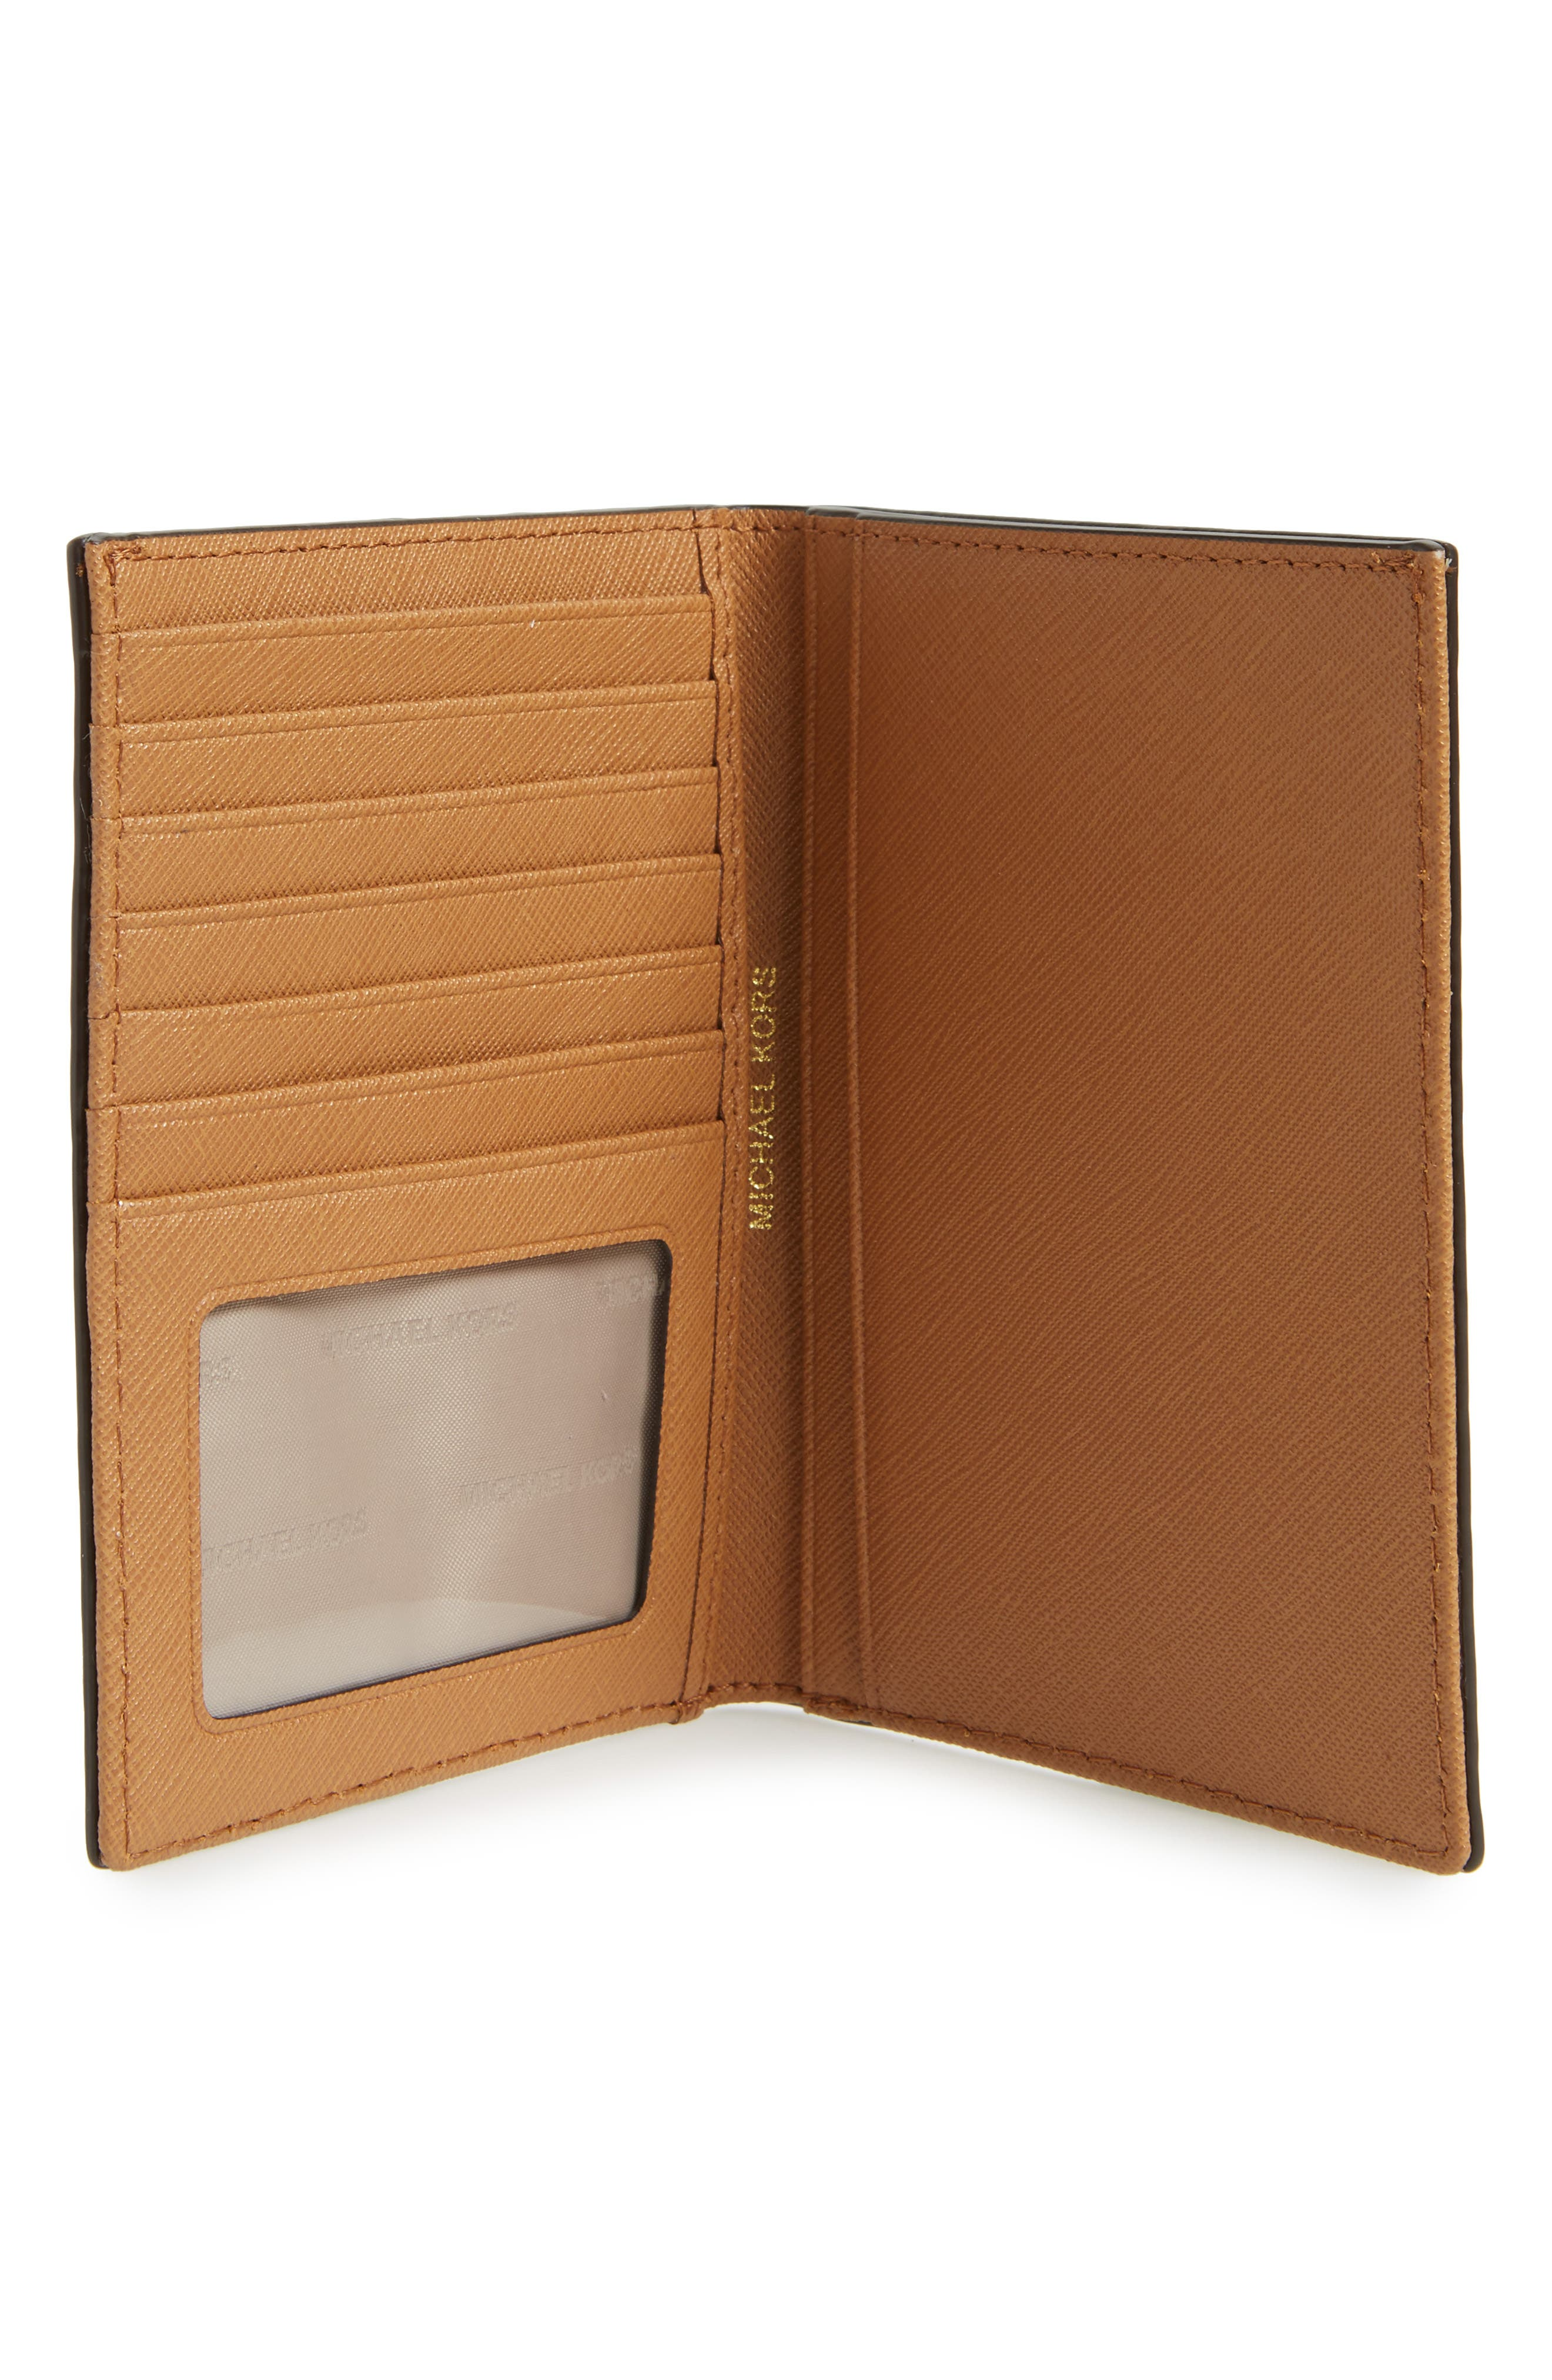 Alternate Image 2  - MICHAEL Michael Kors 'Jet Set' Leather Passport Wallet